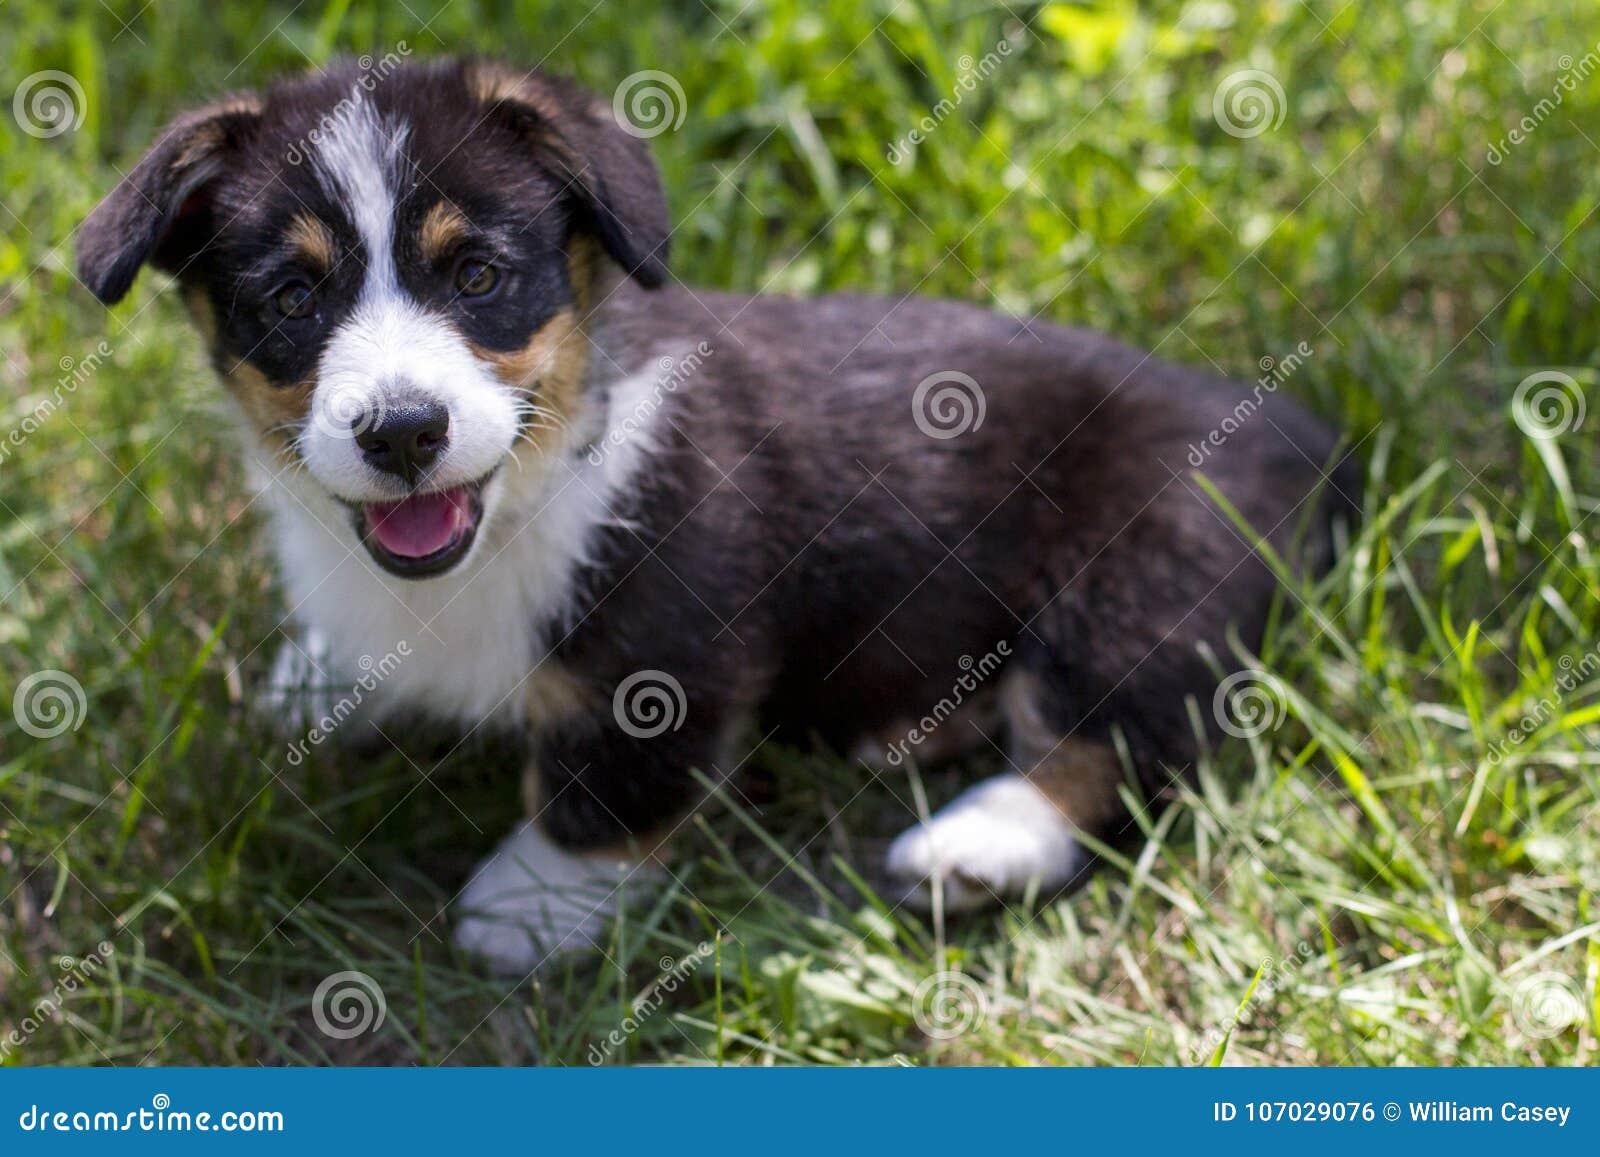 Lächelnder Corgi-Welpe im Gras